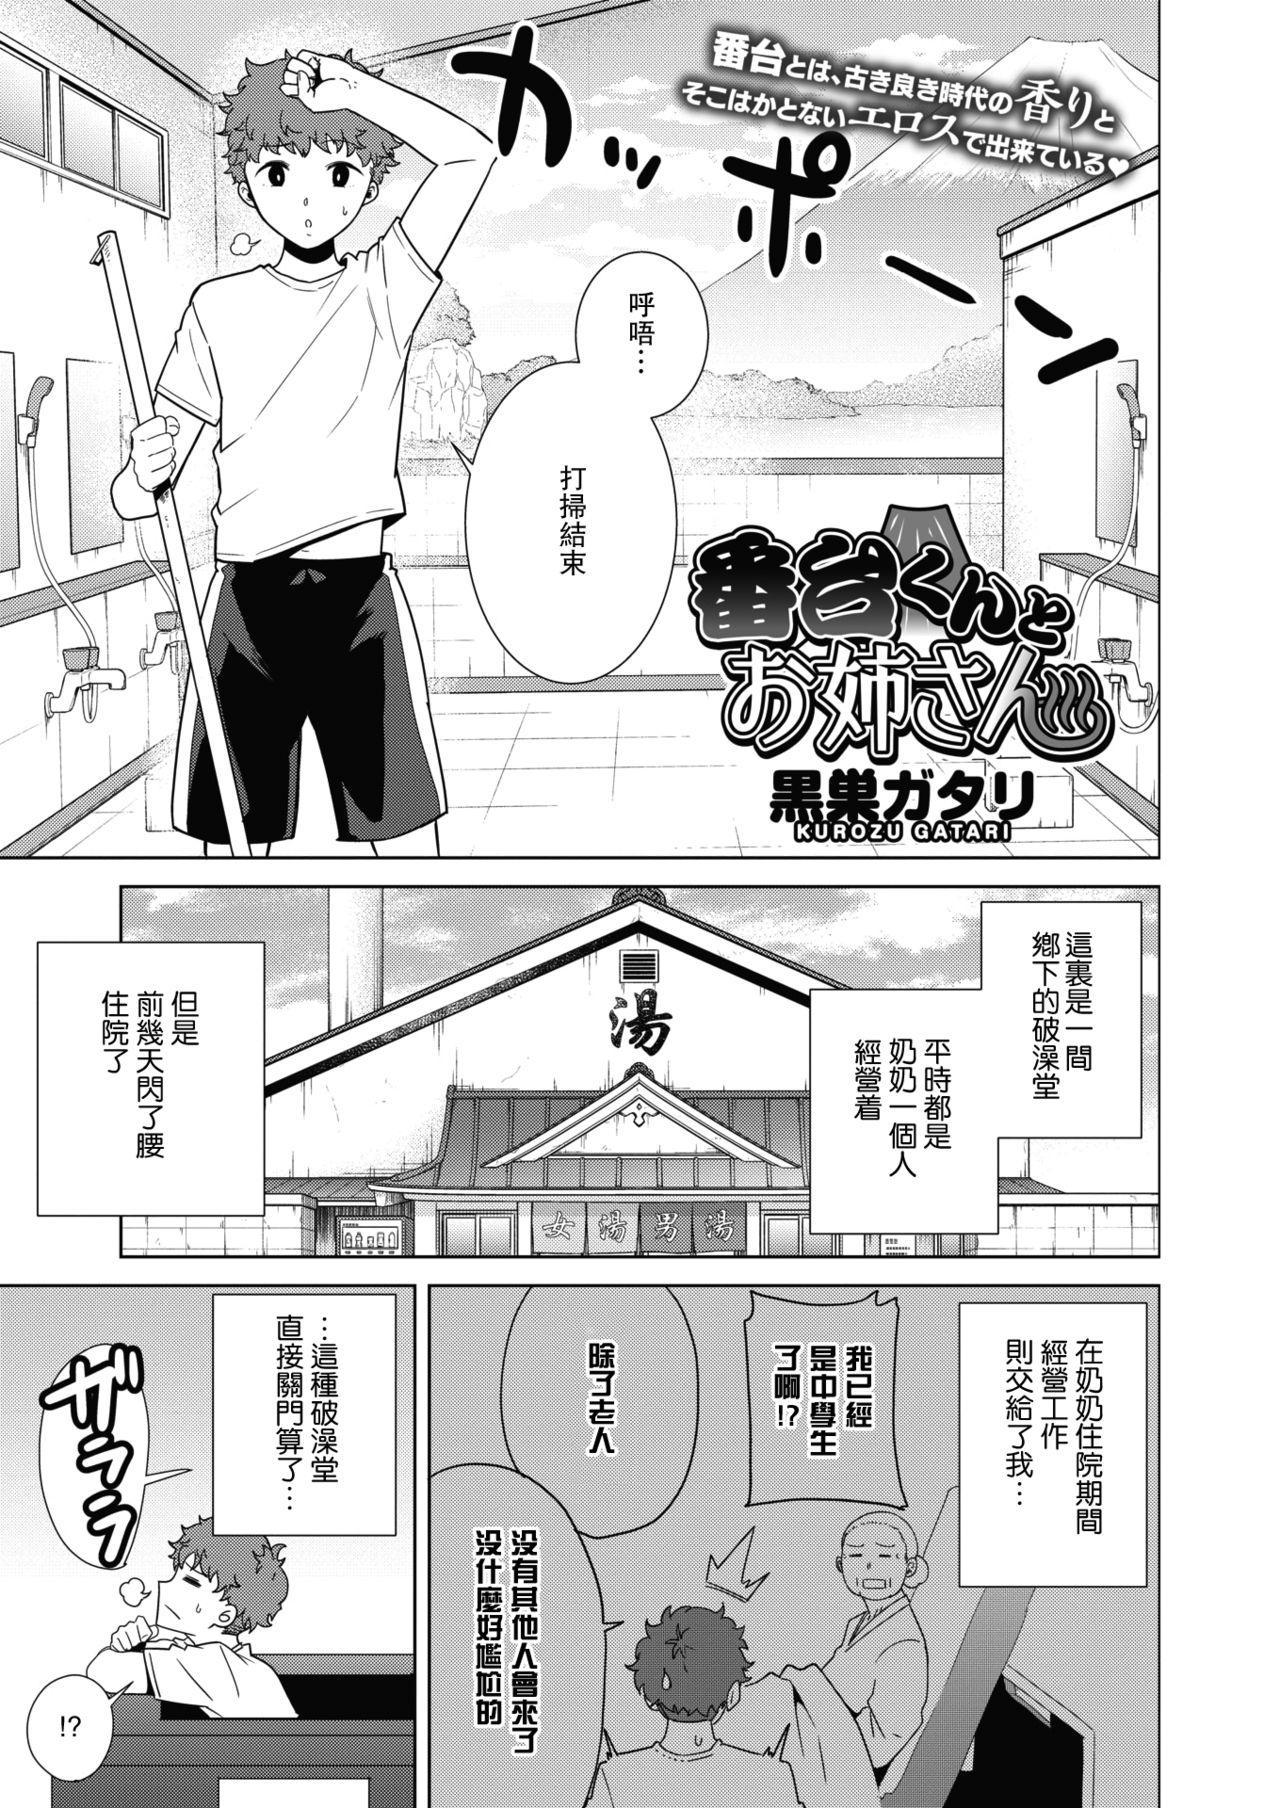 [Kurosu Gatari] Bandai-kun to Onee-san (COMIC HOTMILK 2020-08) [Chinese] [瓜皮汉化] [Digital] 0